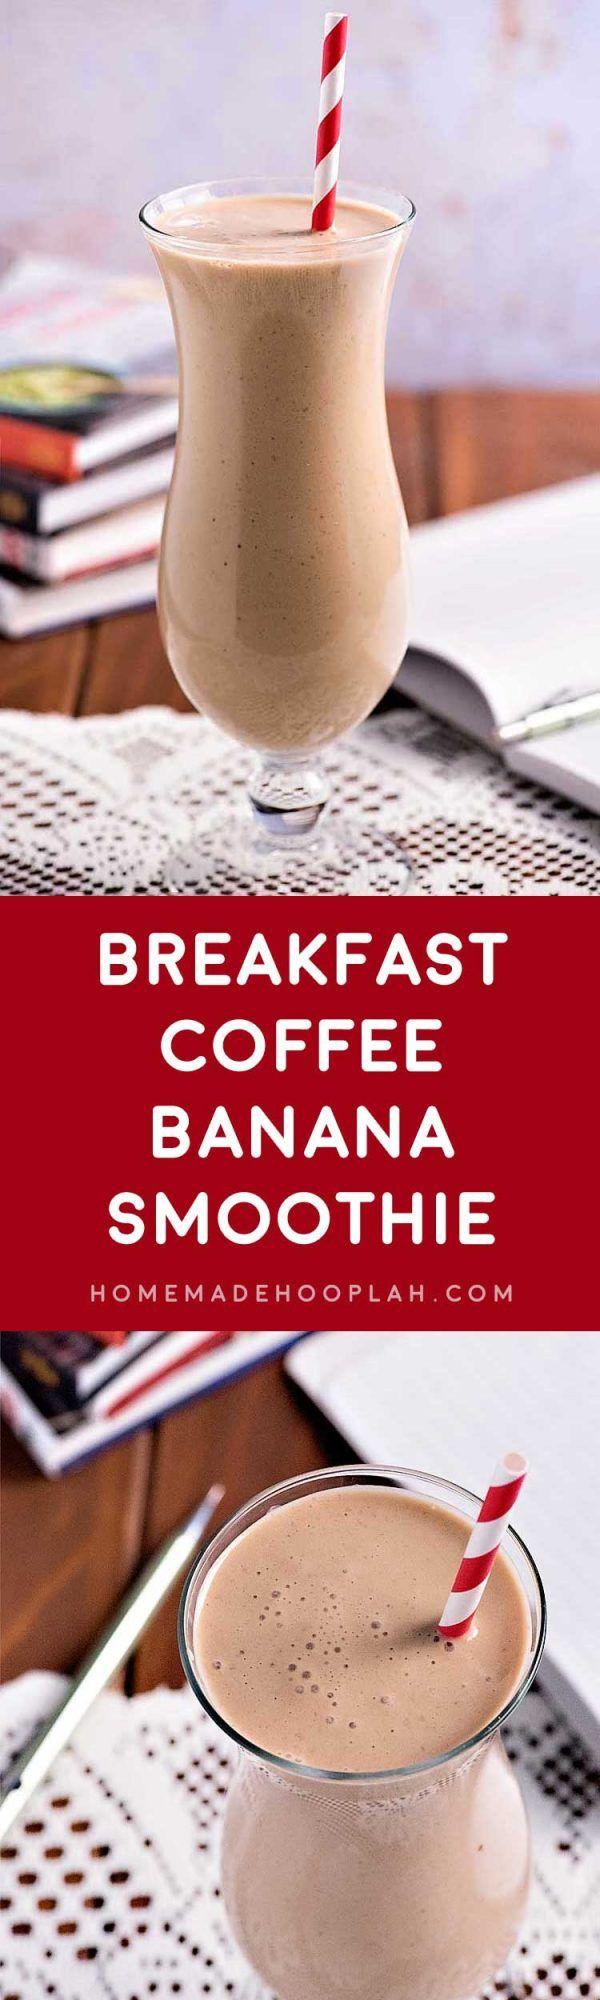 Breakfast Coffee Banana Smoothie - Homemade Hooplah